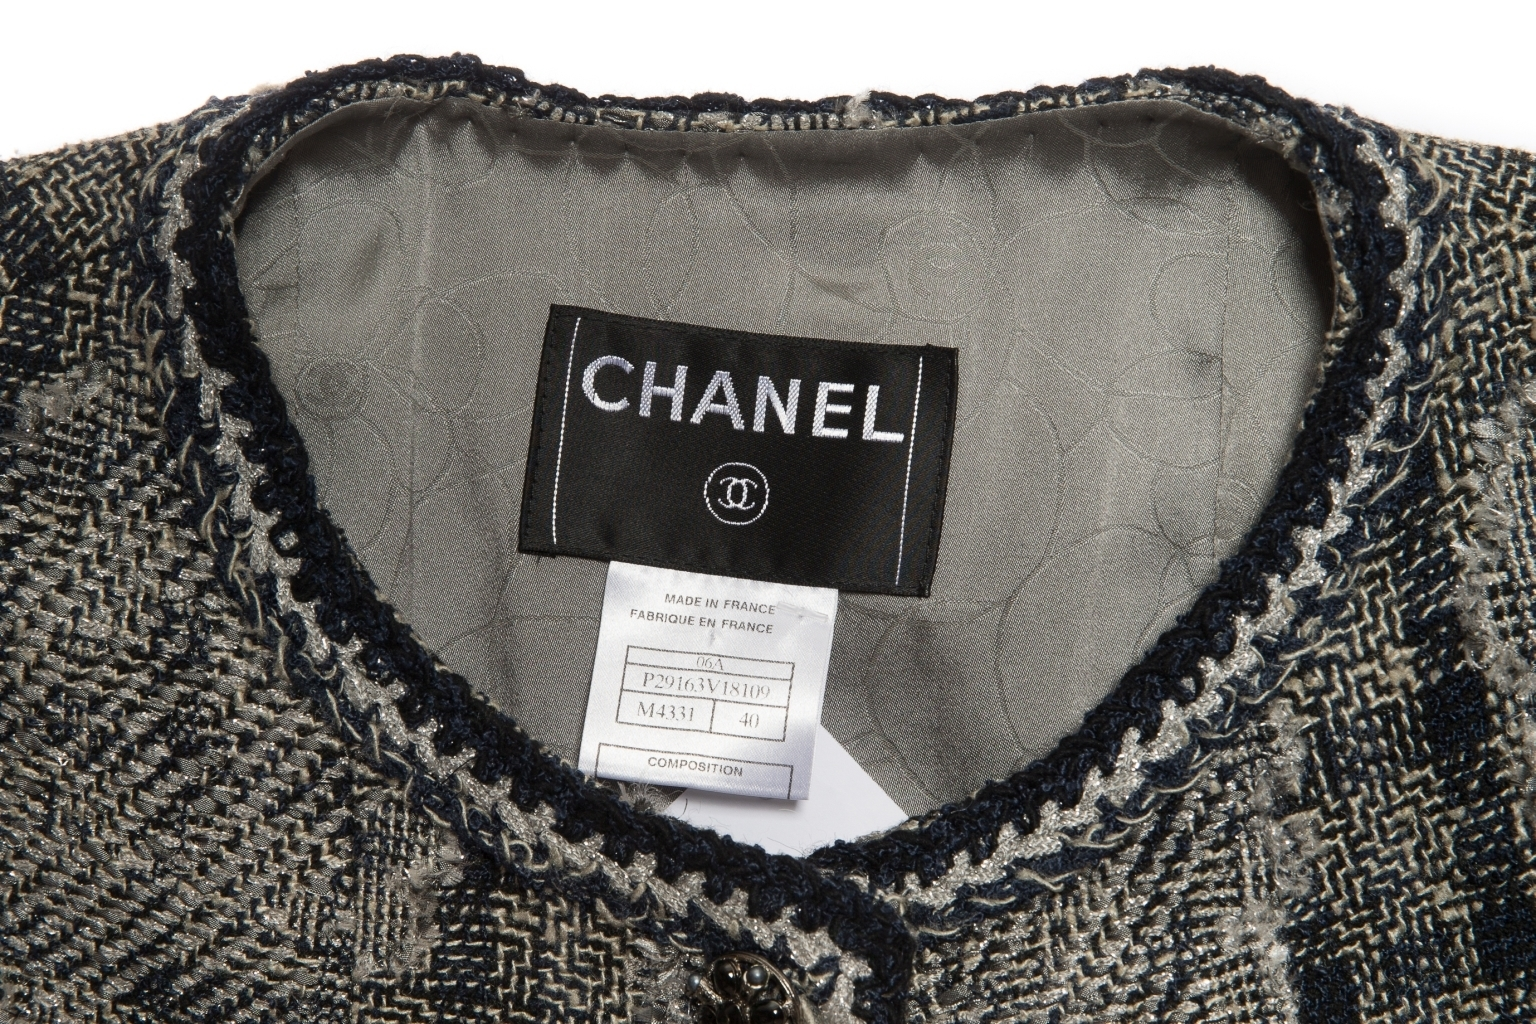 Изысканный жакет из твида от Chanel, 40 размер.